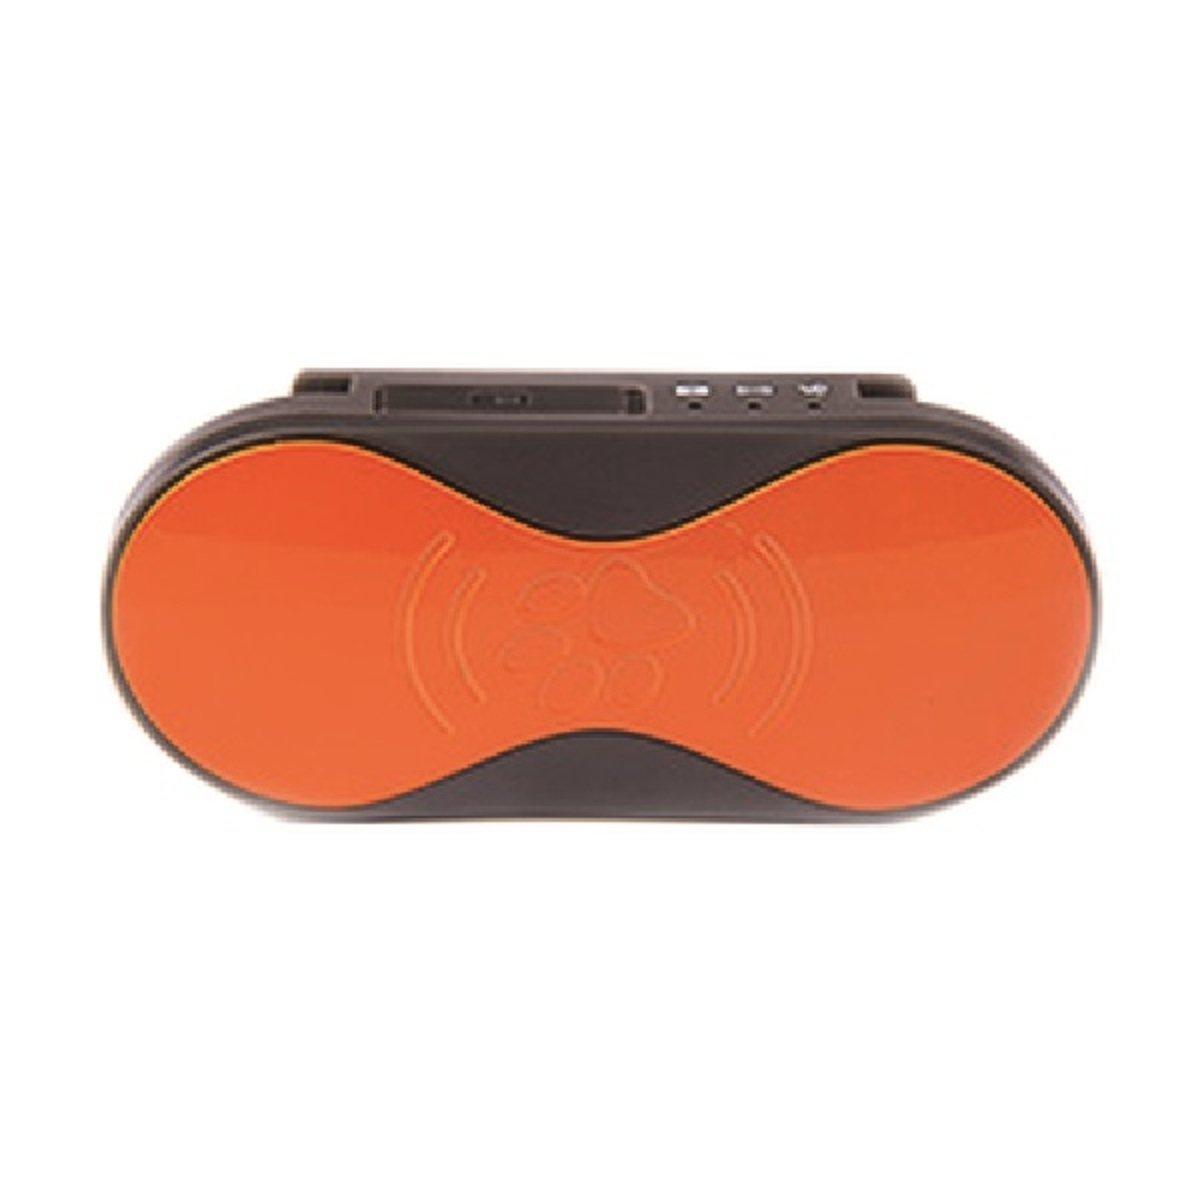 Lite Guardian®航通守護者-寵物追蹤器-橙色